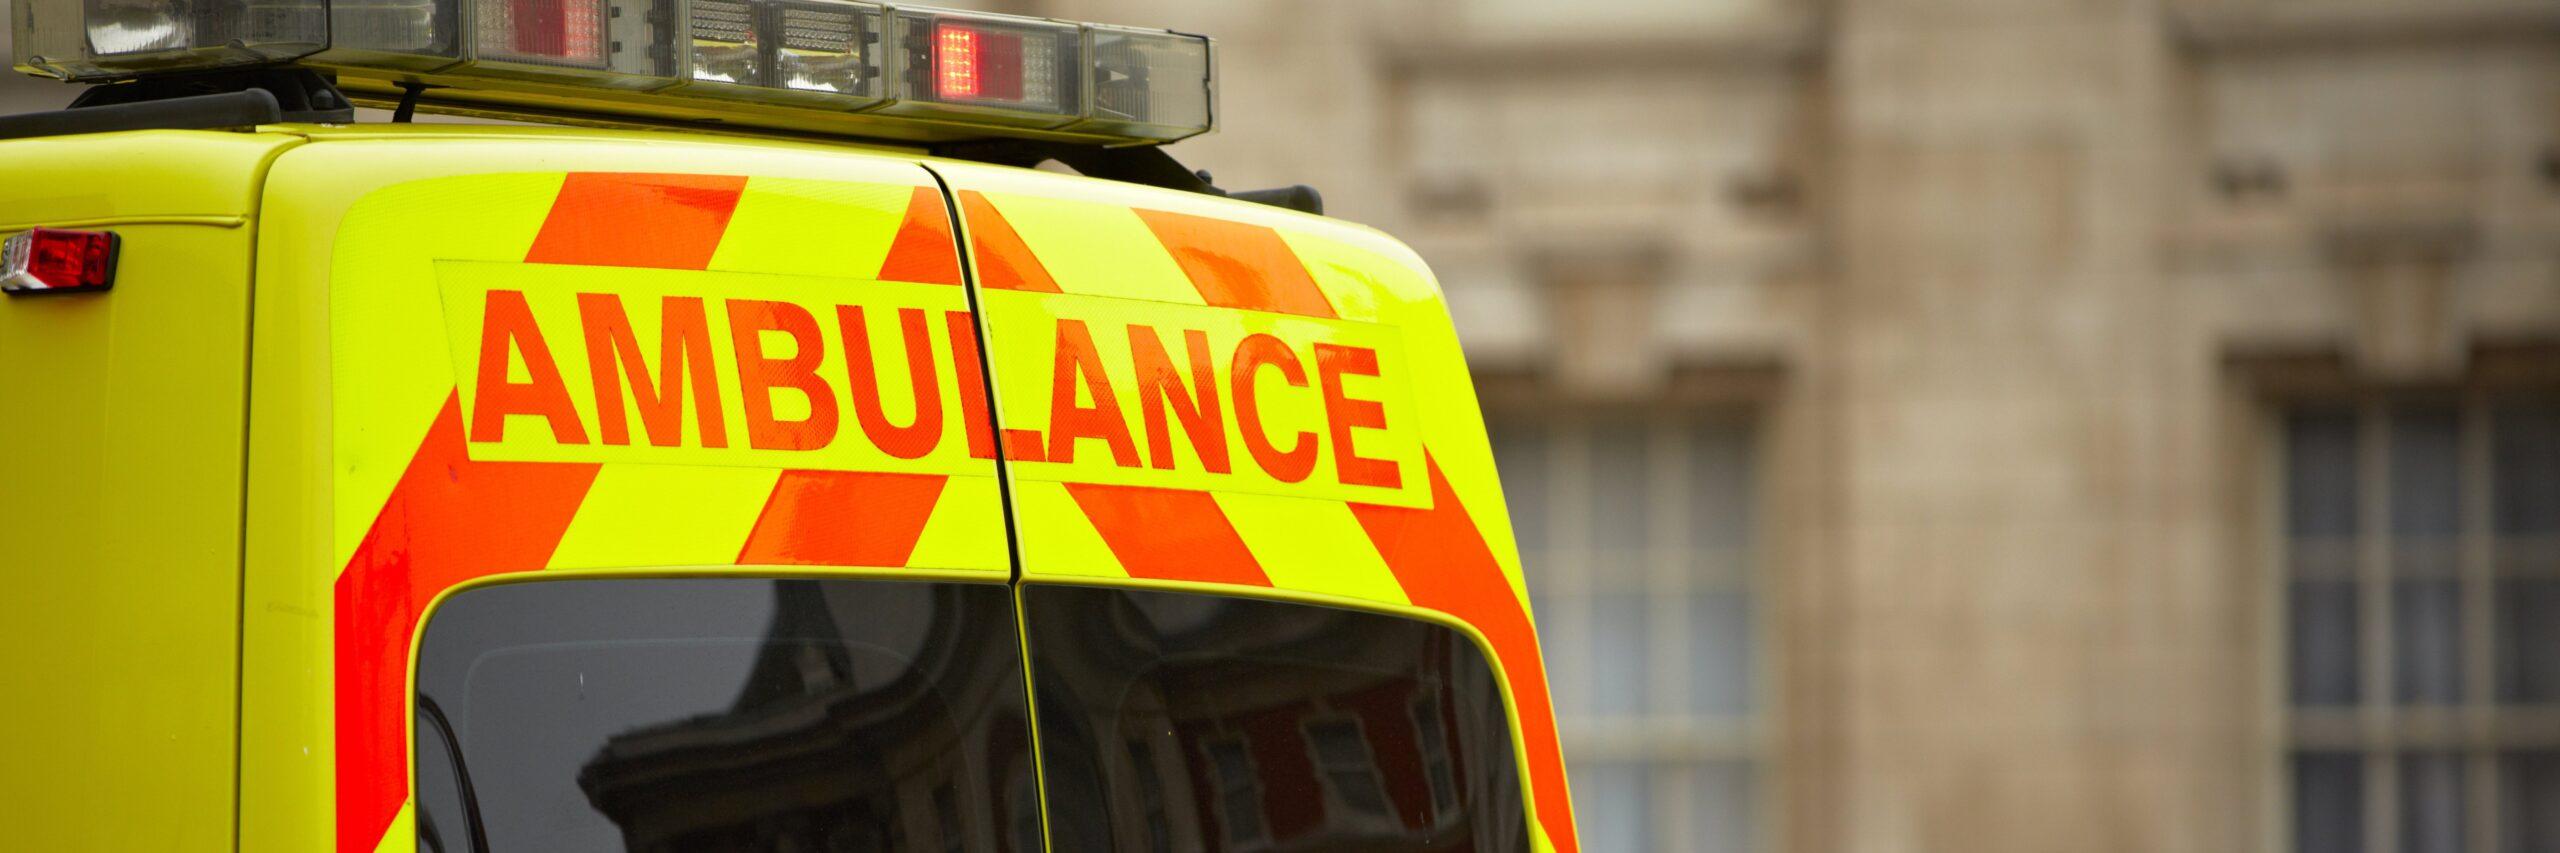 Ambulance-Fotolia.jpg